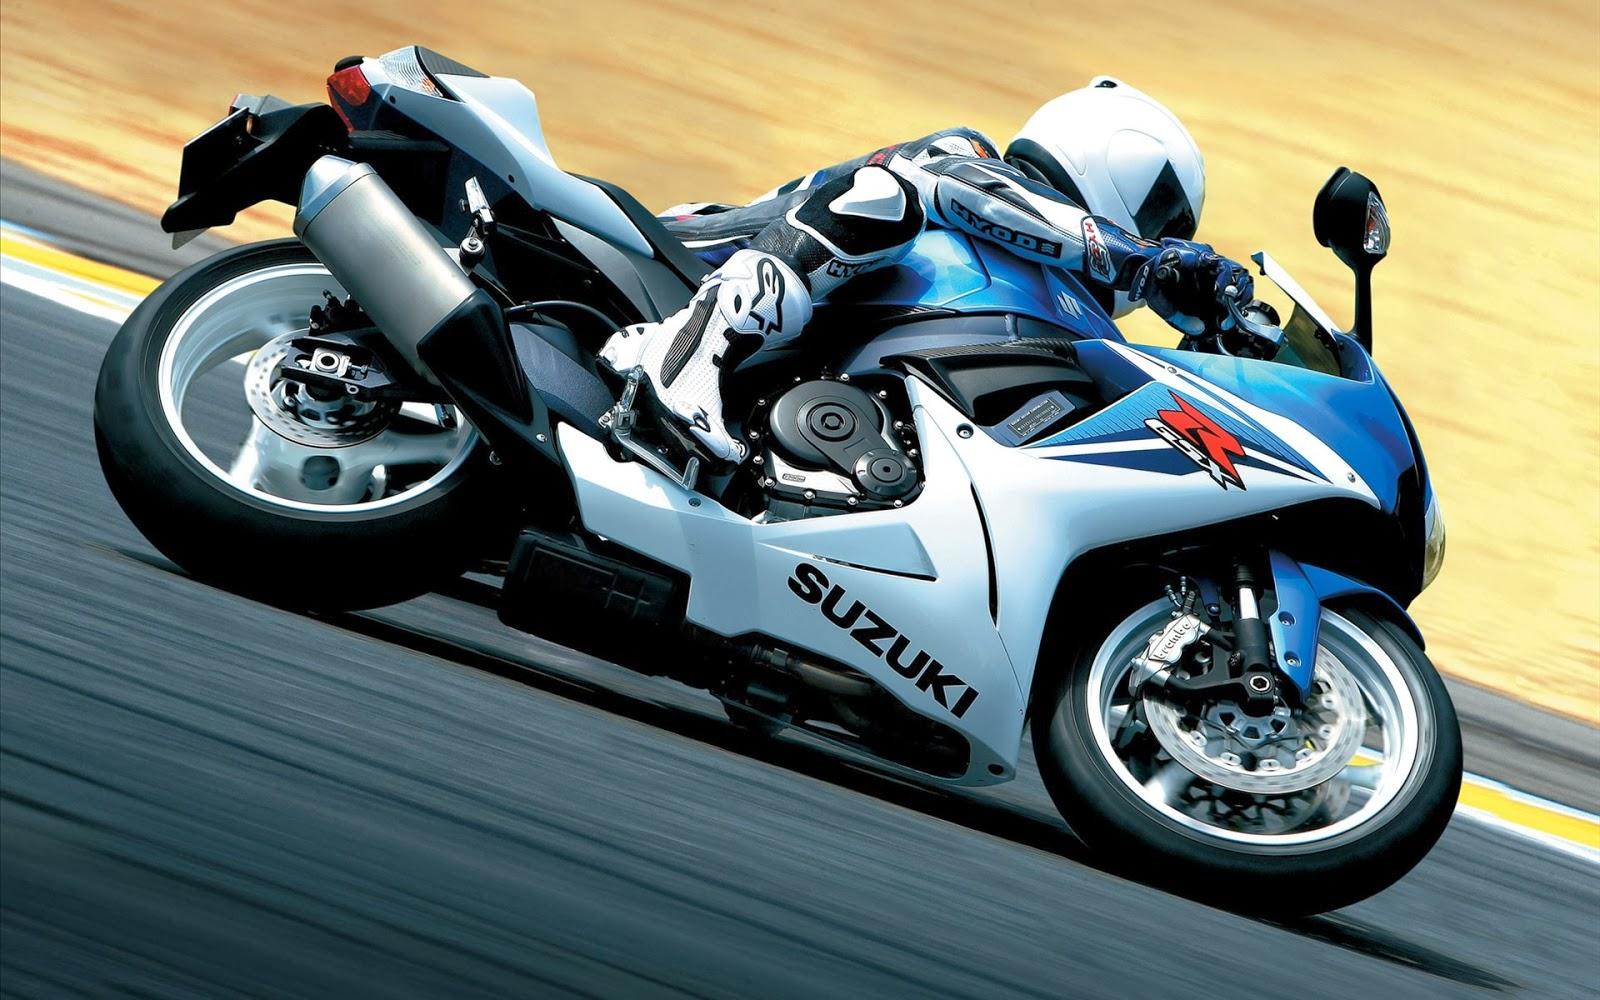 Motorcycle Racing On The Sand Suzuki Hd Desktop Mobile: HD Bike Wallpapers 1080p